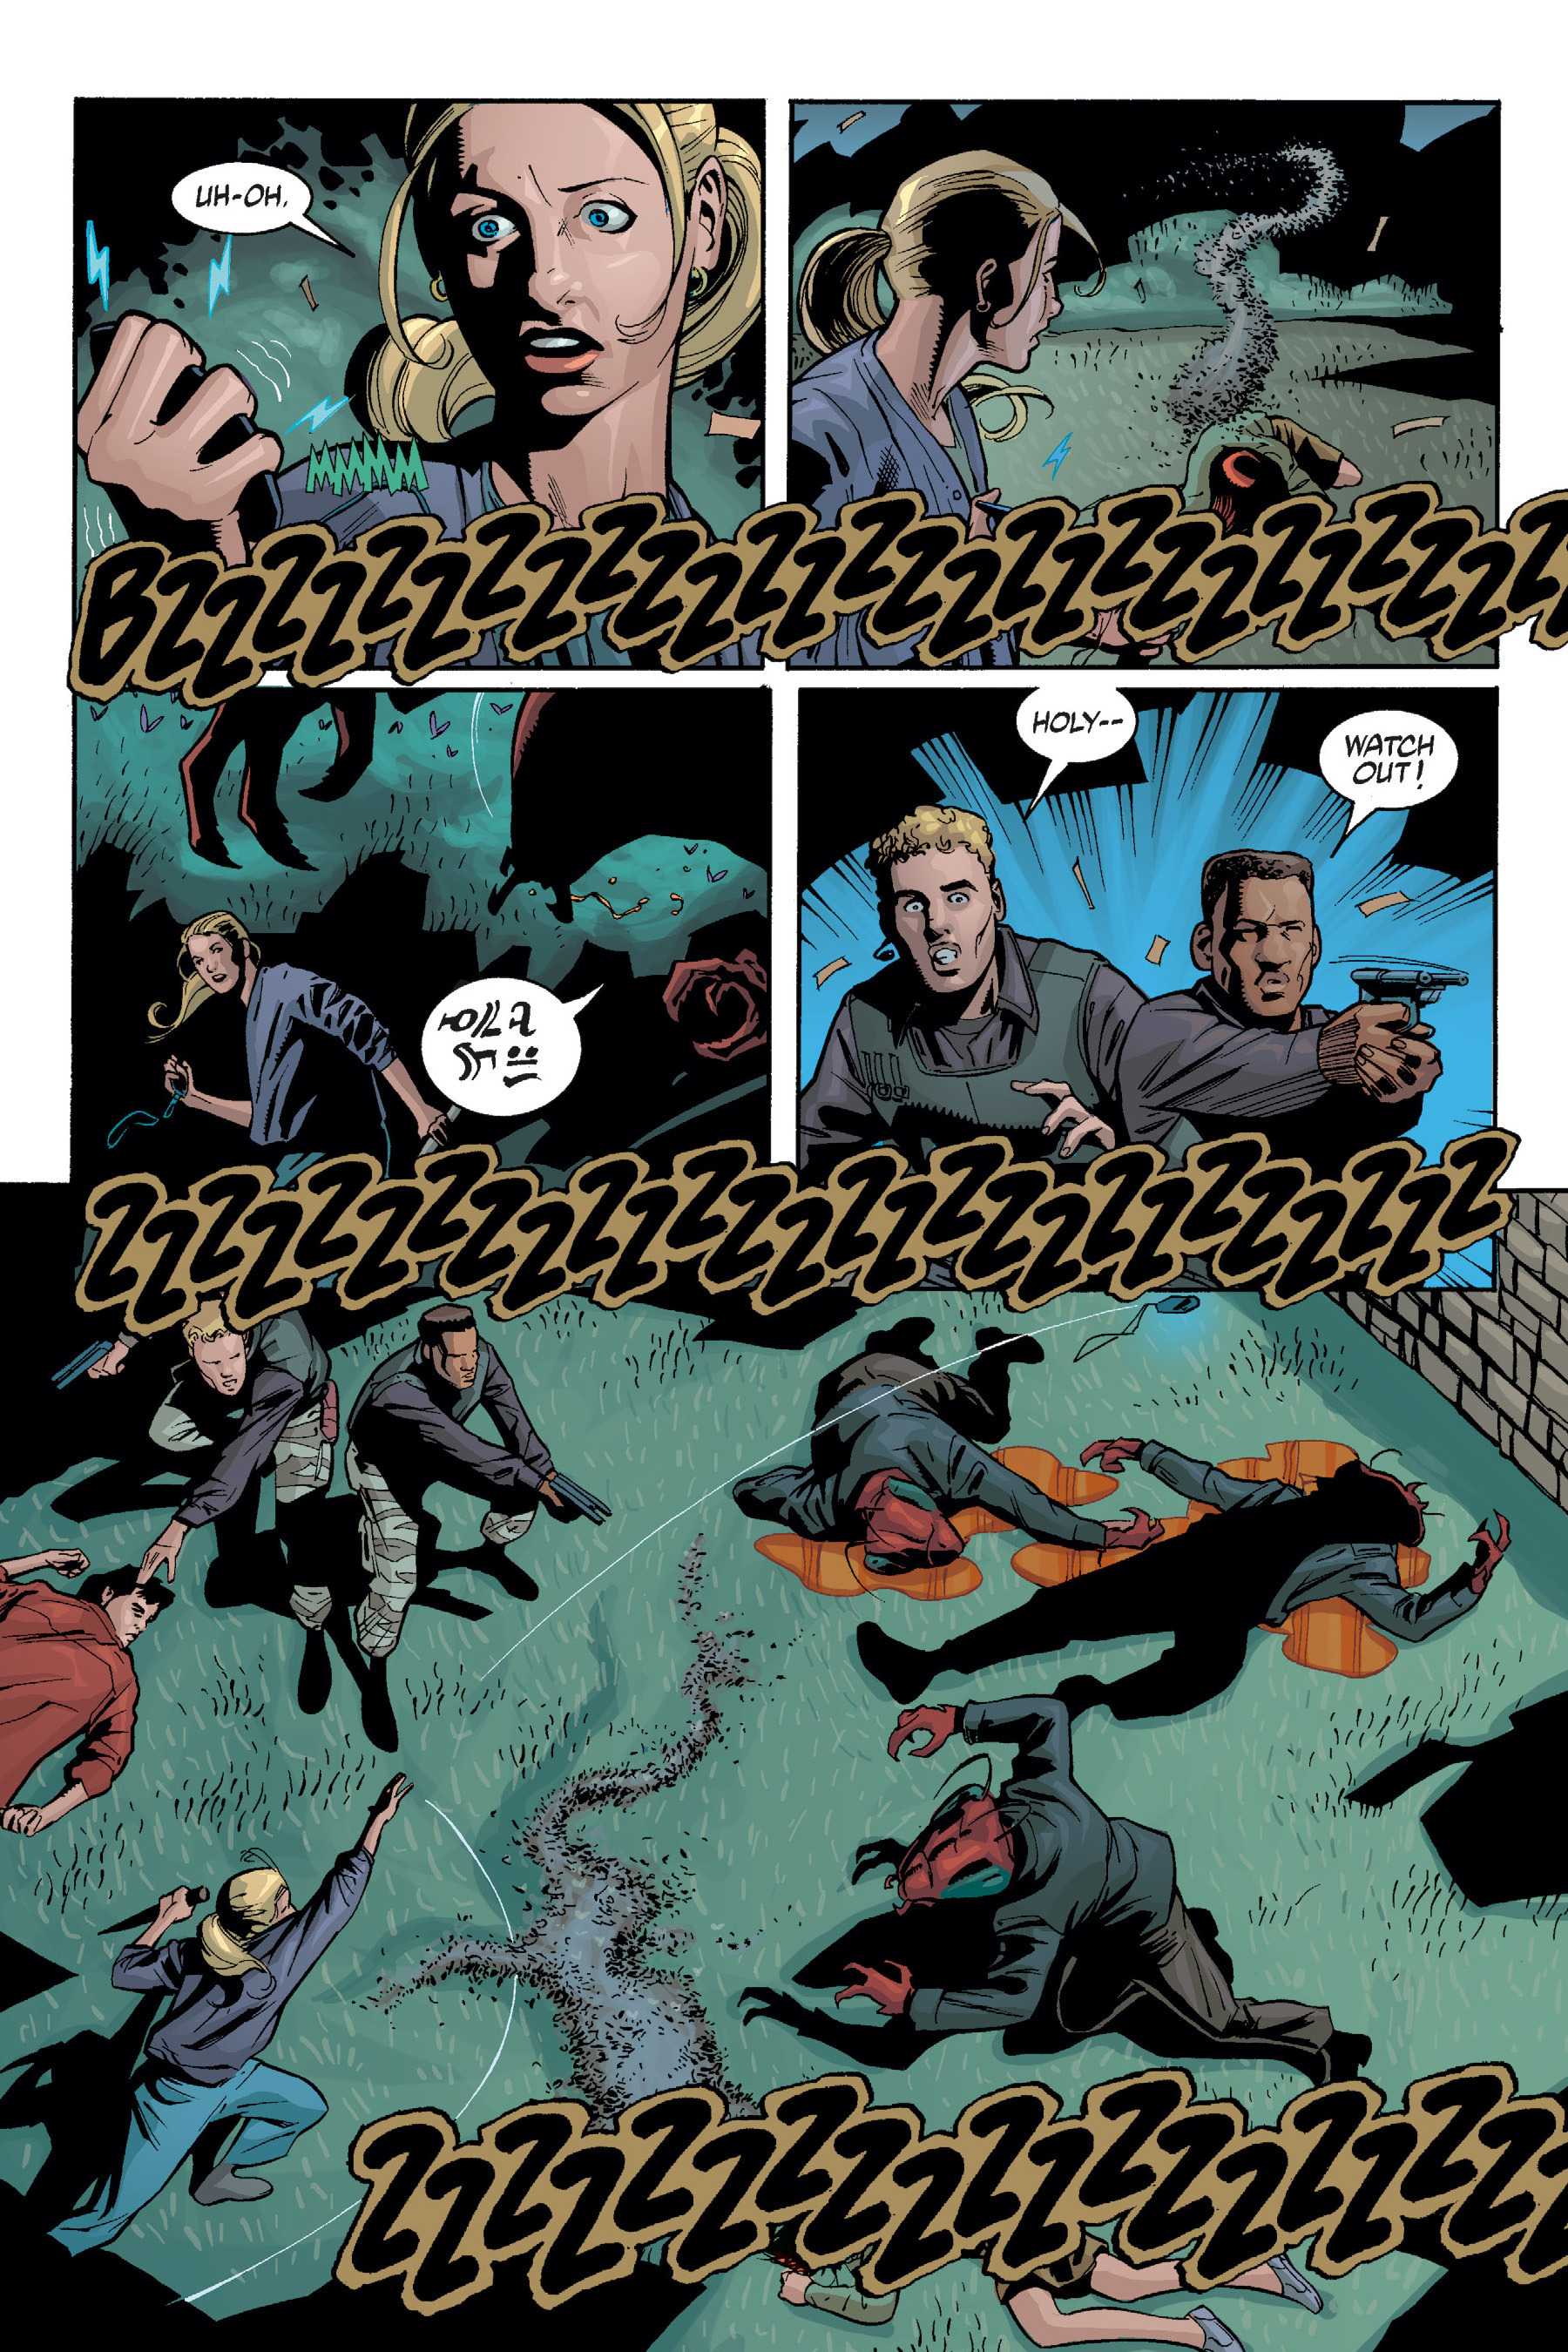 Read online Buffy the Vampire Slayer: Omnibus comic -  Issue # TPB 5 - 108